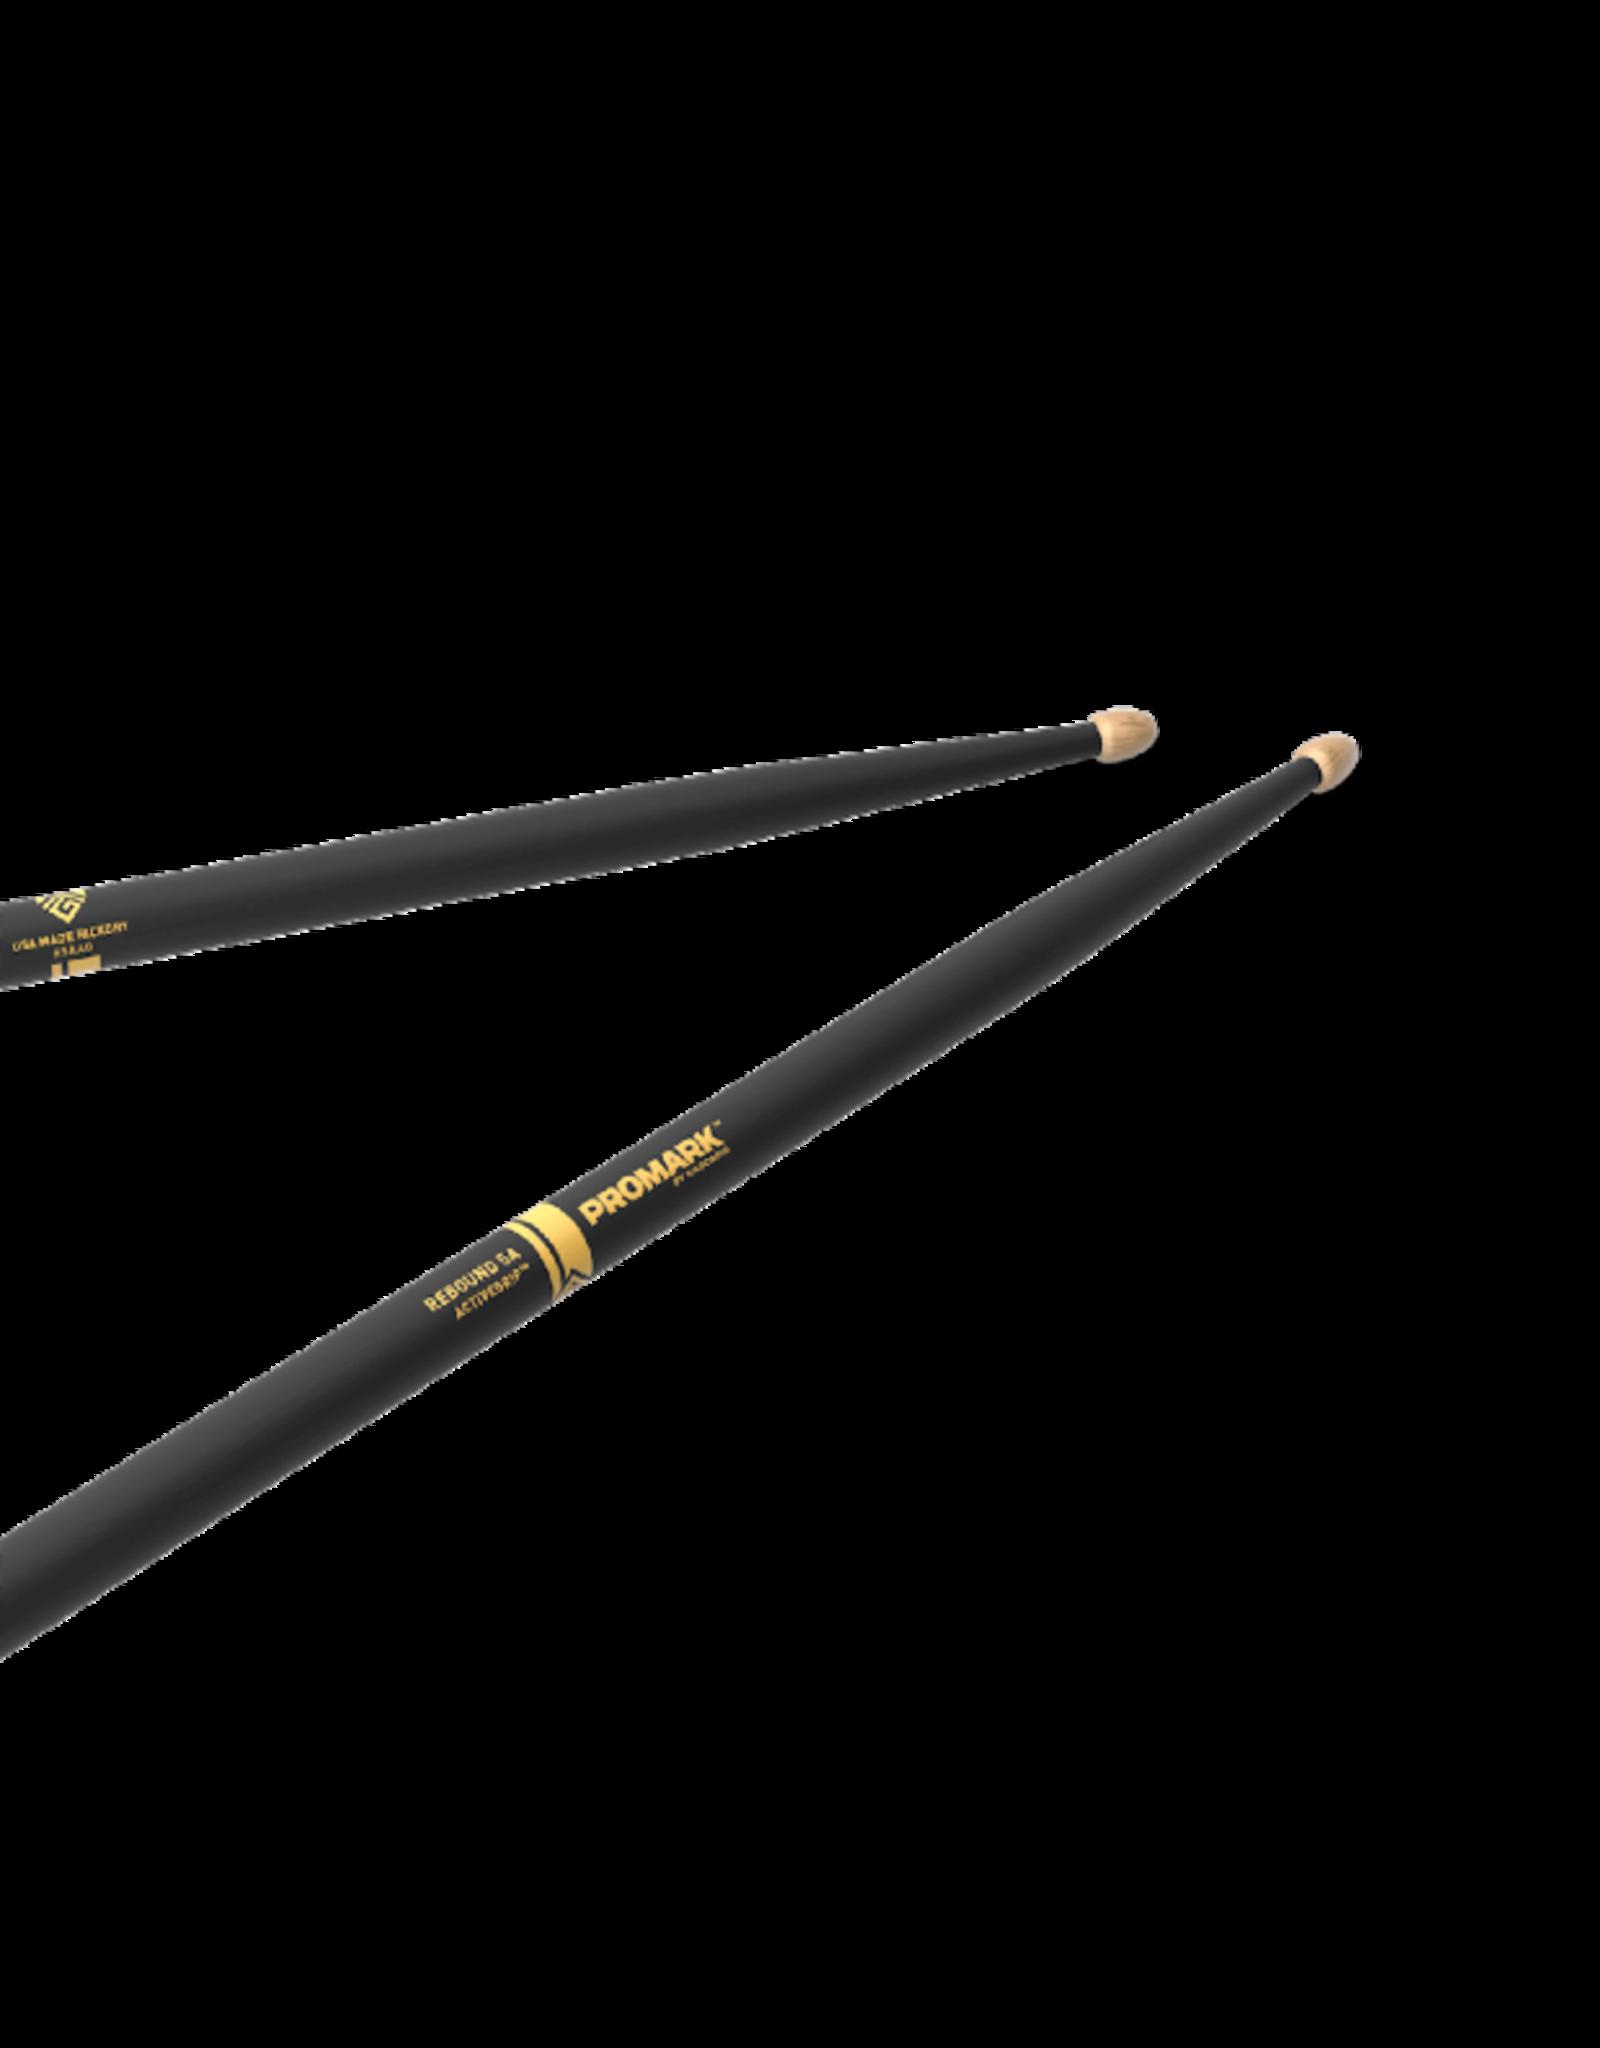 Promark Promark REBOUND 5A ACTIVEGRIP Hickory Wood Tip Drumstick